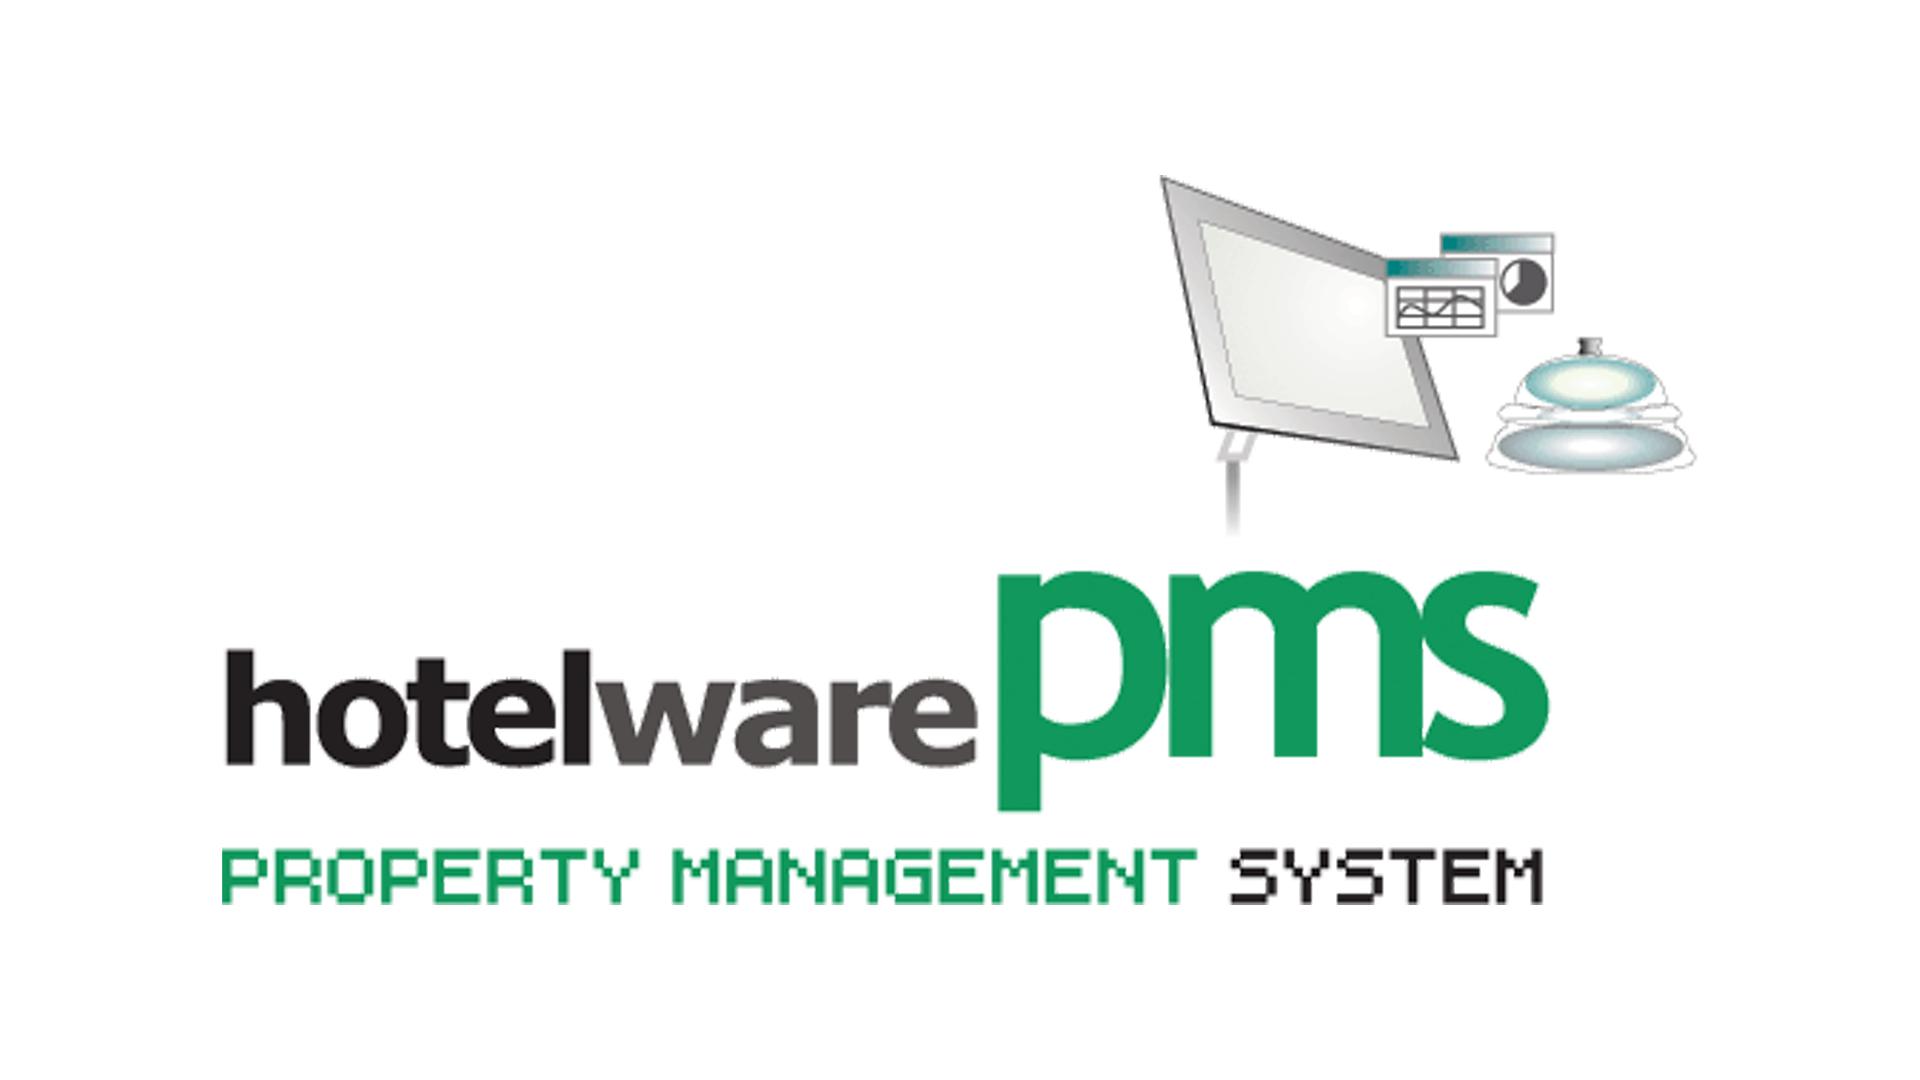 Hotelware PMS logo